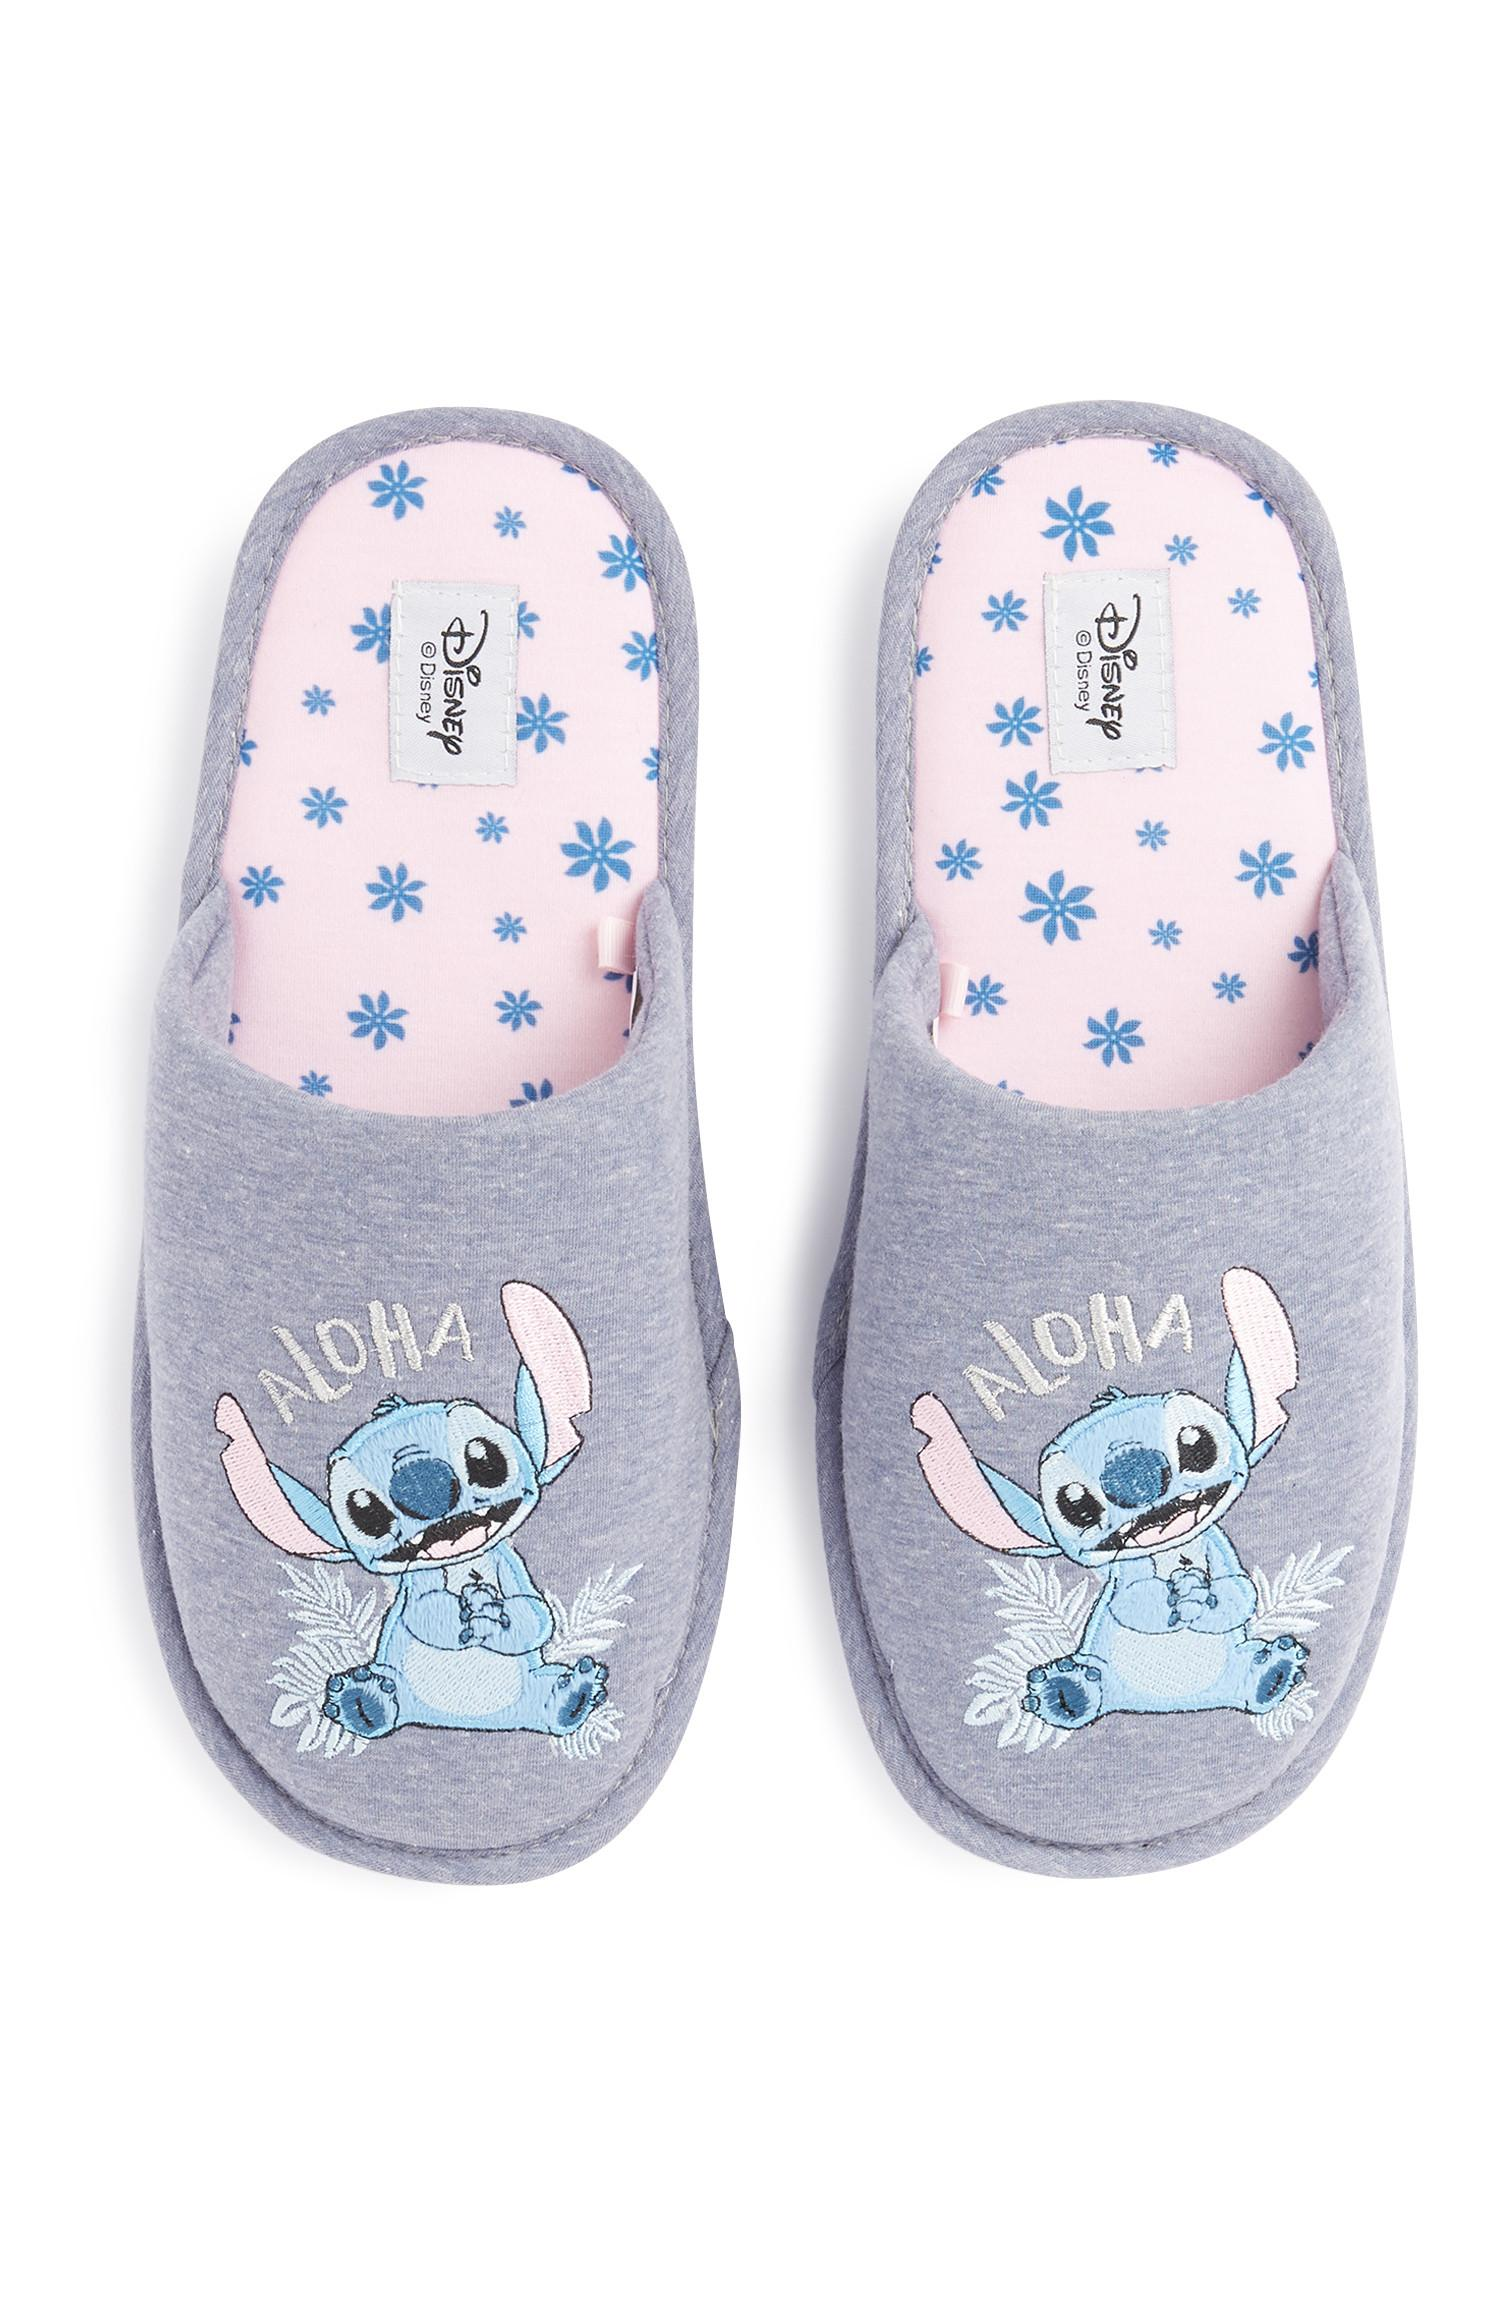 Stitch Slippers